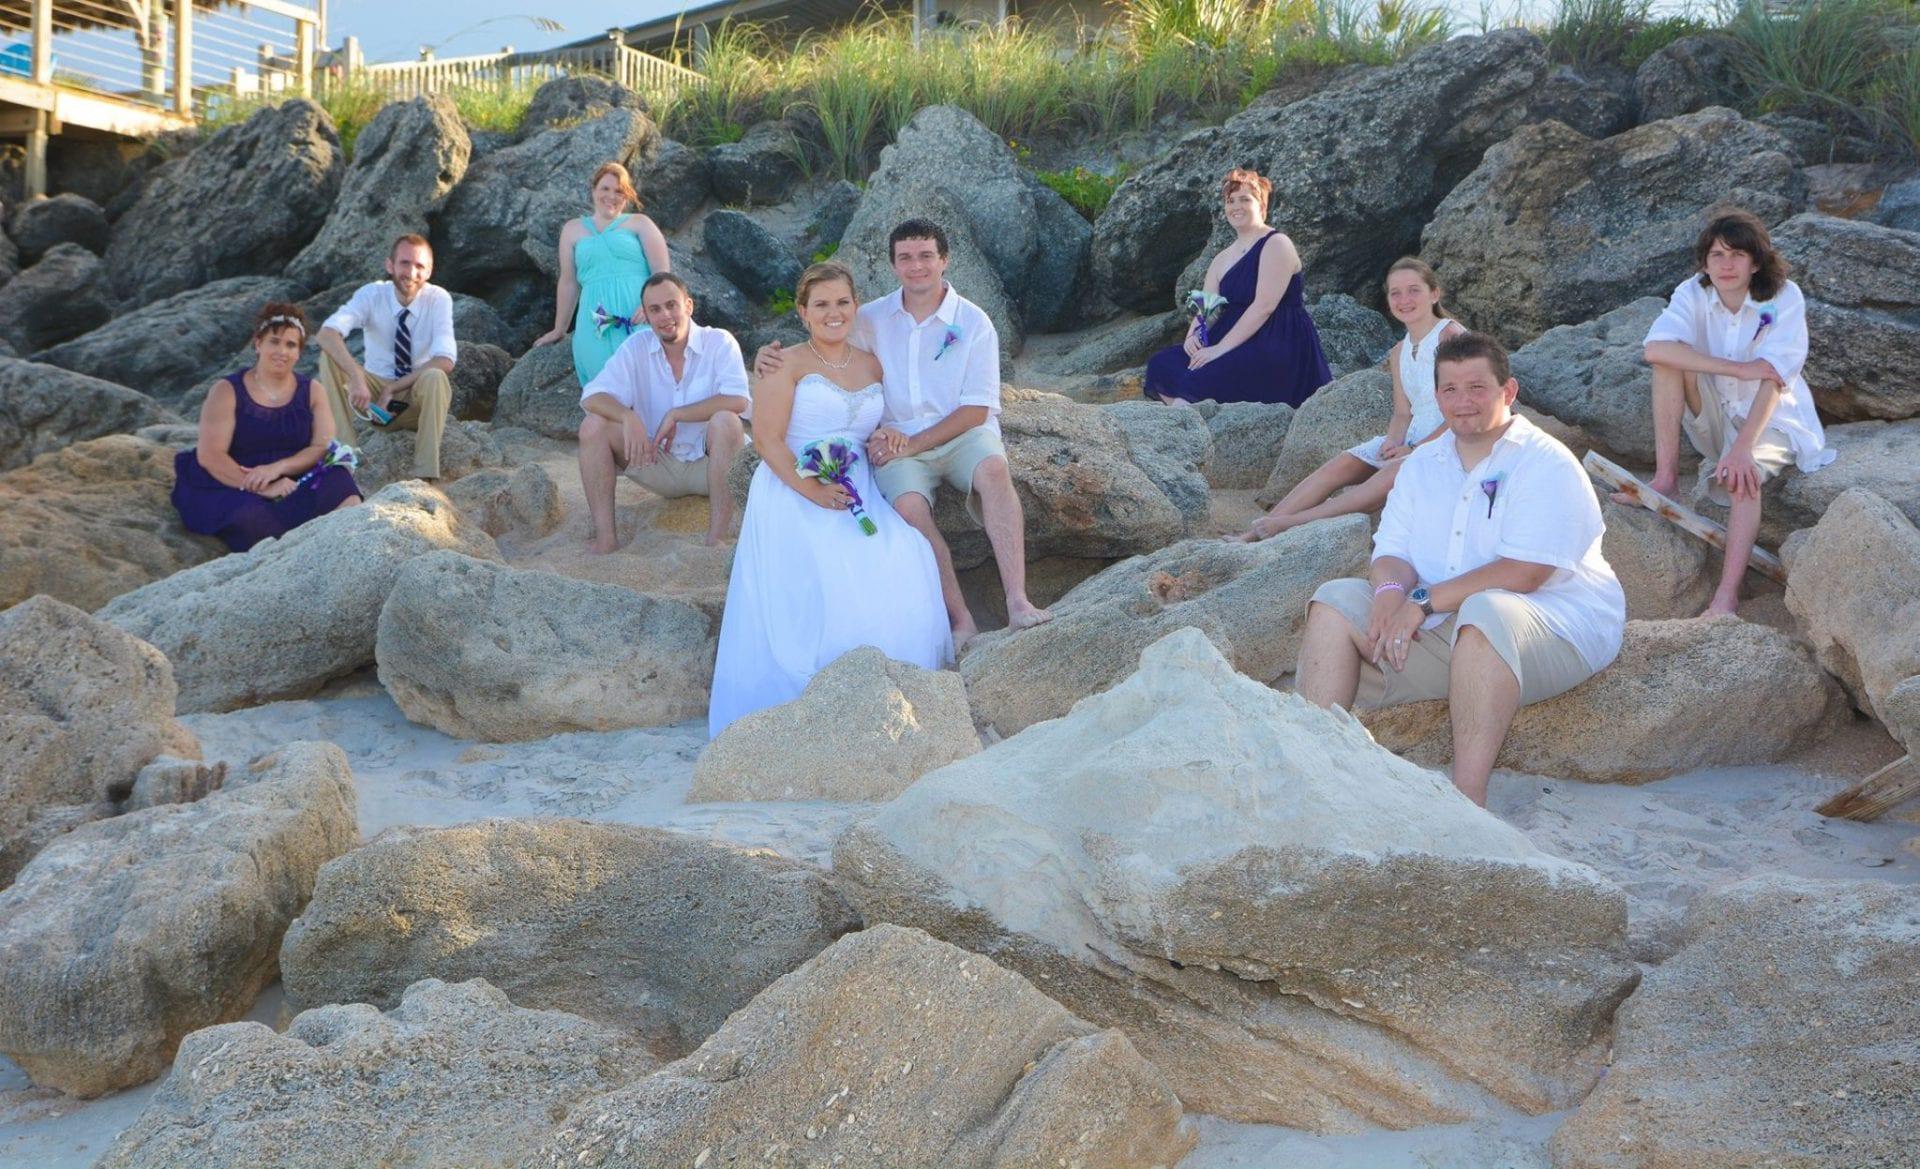 Bridal party on rocks after beach wedding on New Smyrna Beach, Florida